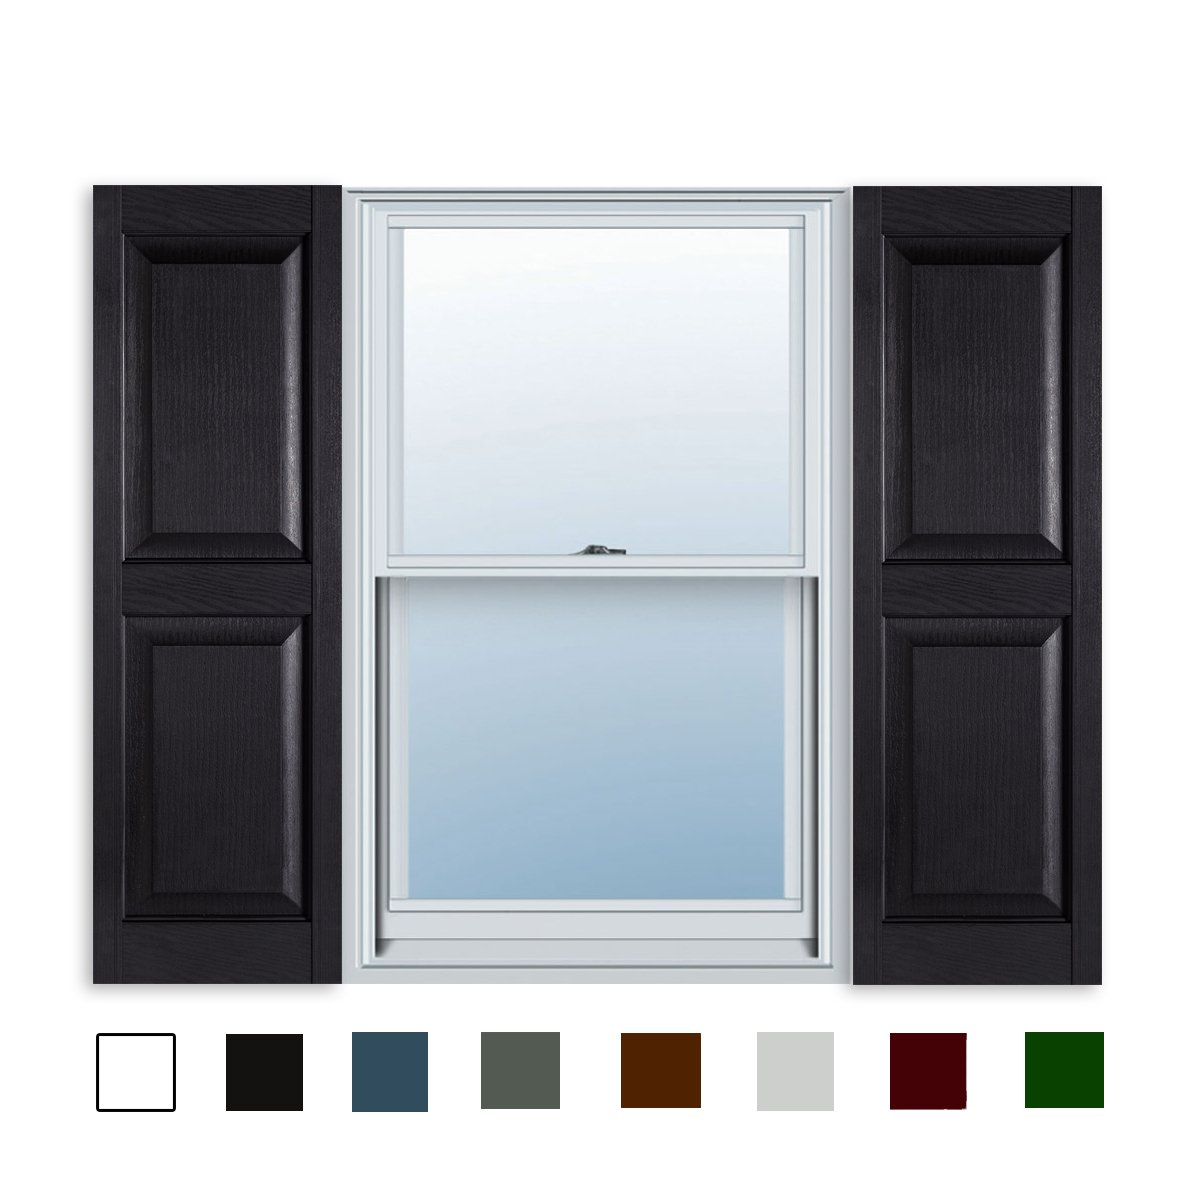 ExteriorSolutions.com 15 Inch x 55 Inch Standard Raised Panel Exterior Vinyl Shutters, Black (Pair)